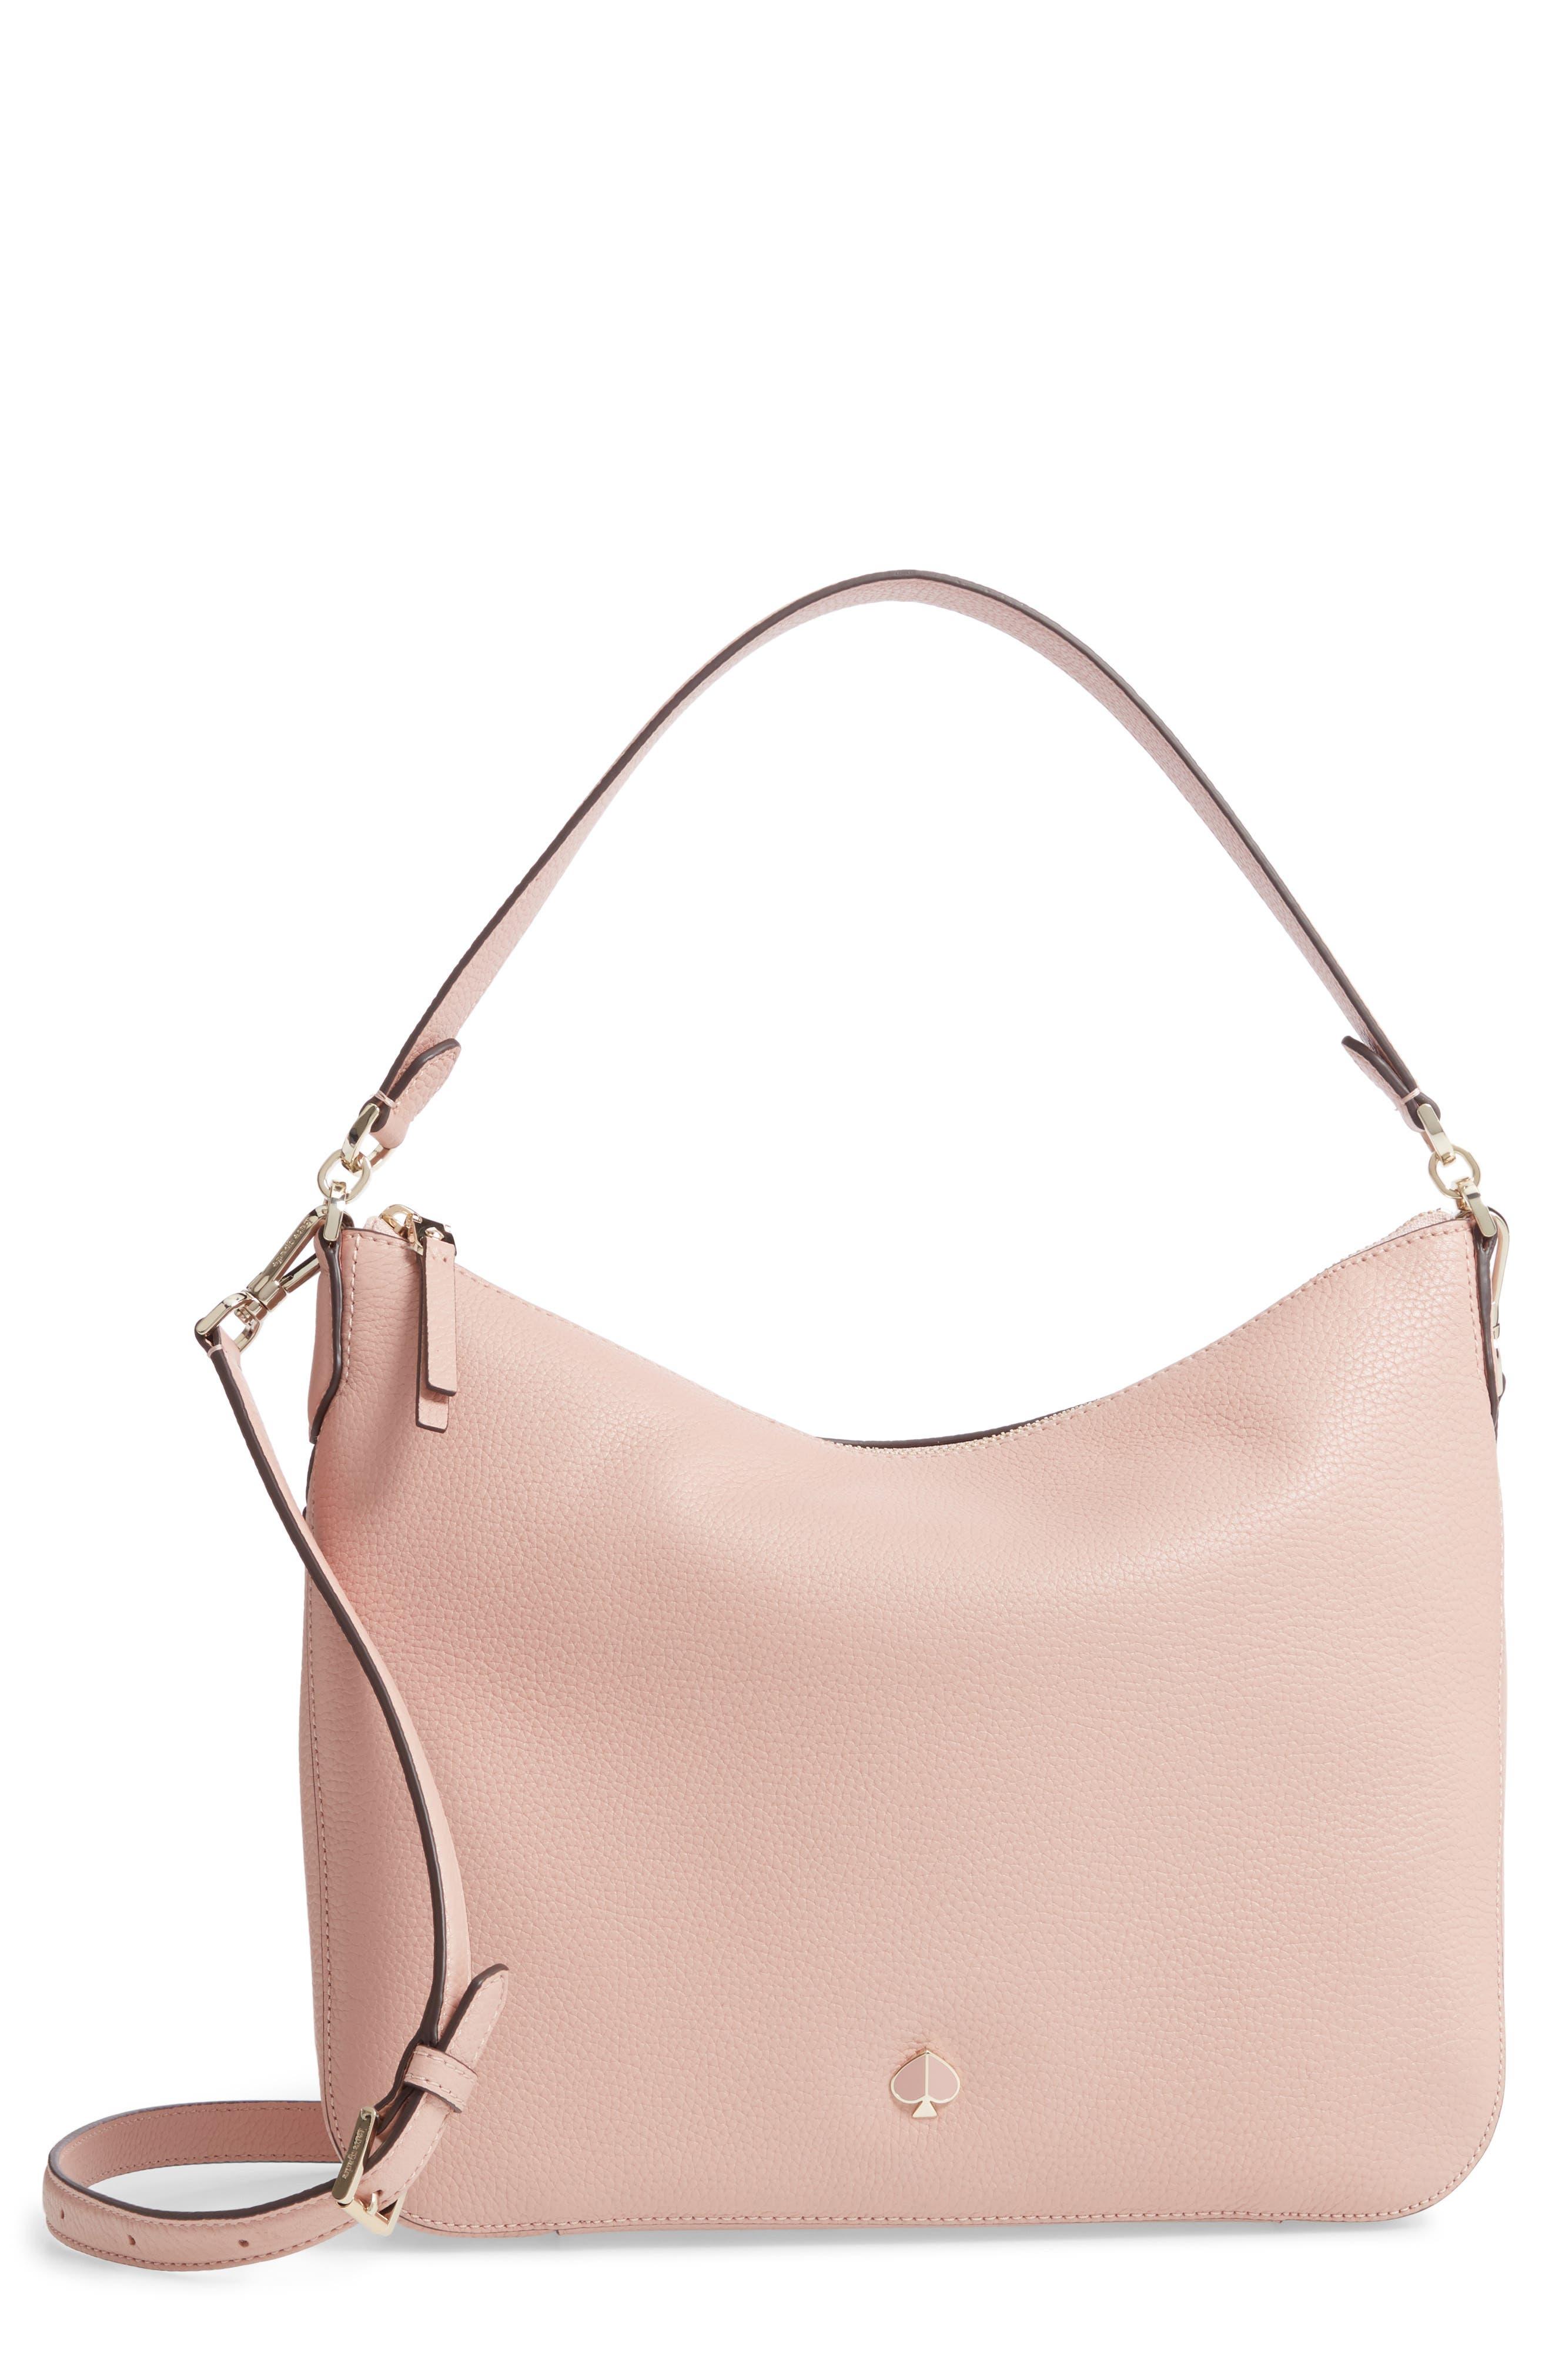 KATE SPADE NEW YORK medium polly leather shoulder bag, Main, color, FLAPPER PINK